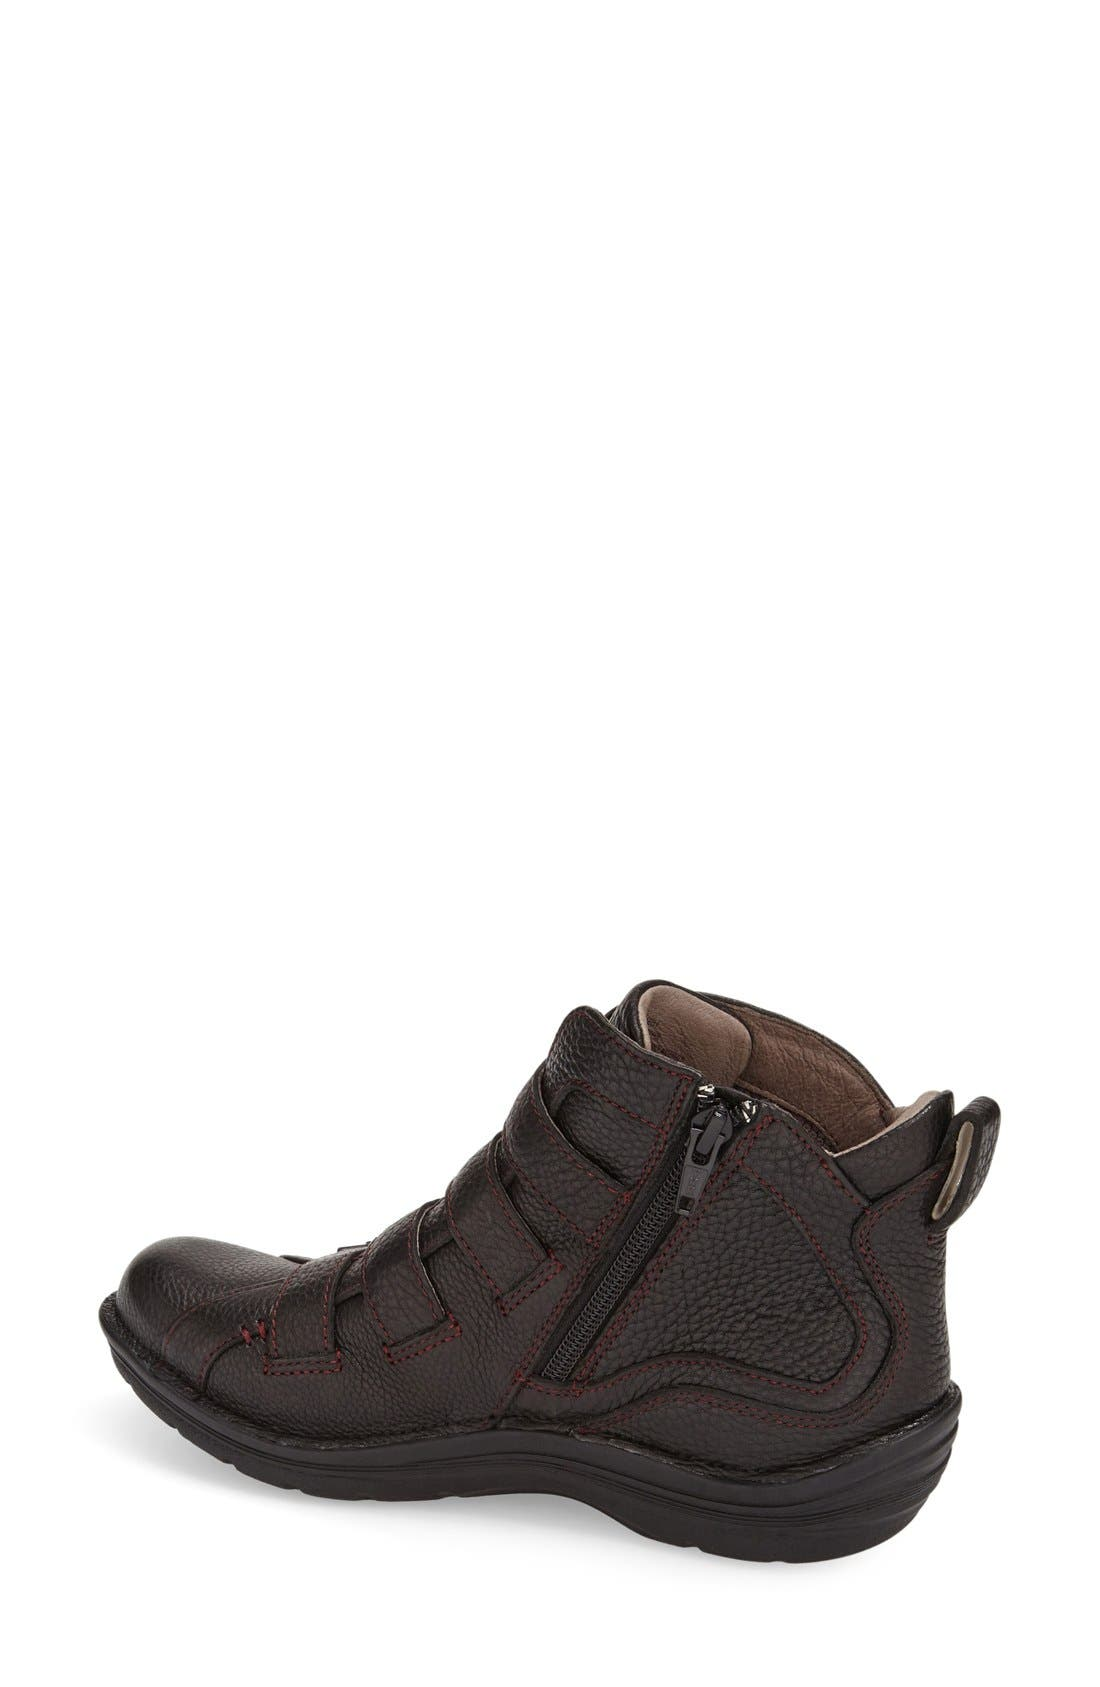 'Orion' Bootie,                             Alternate thumbnail 2, color,                             Black Leather